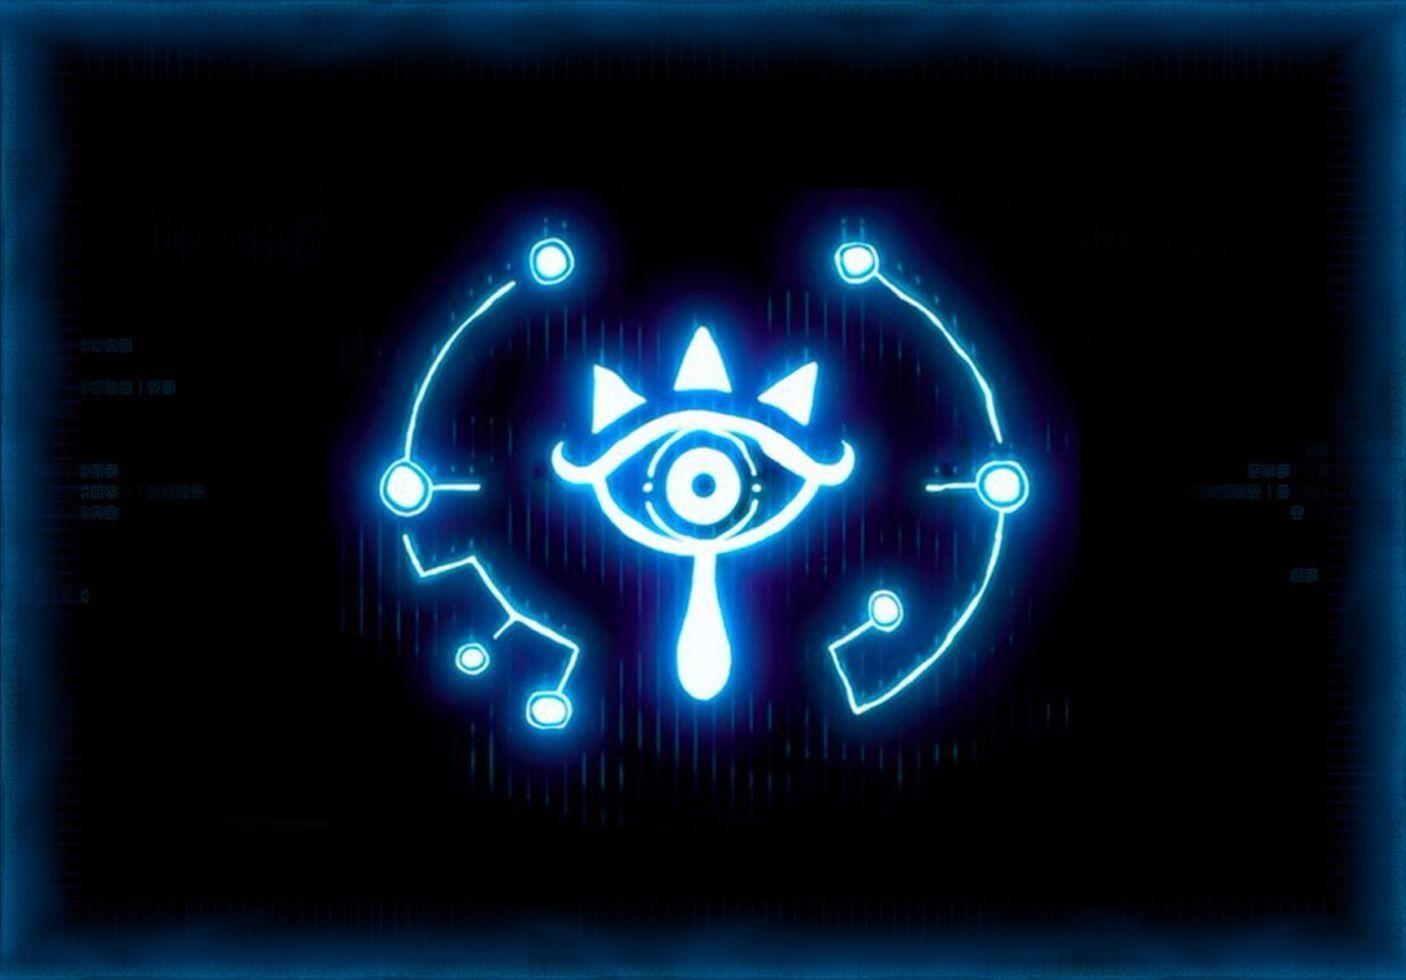 Legend Of Zelda Breath Of The Wild Wallpaper Hd The Sheikah Alphabet Font Is Now Here Zelda Universe